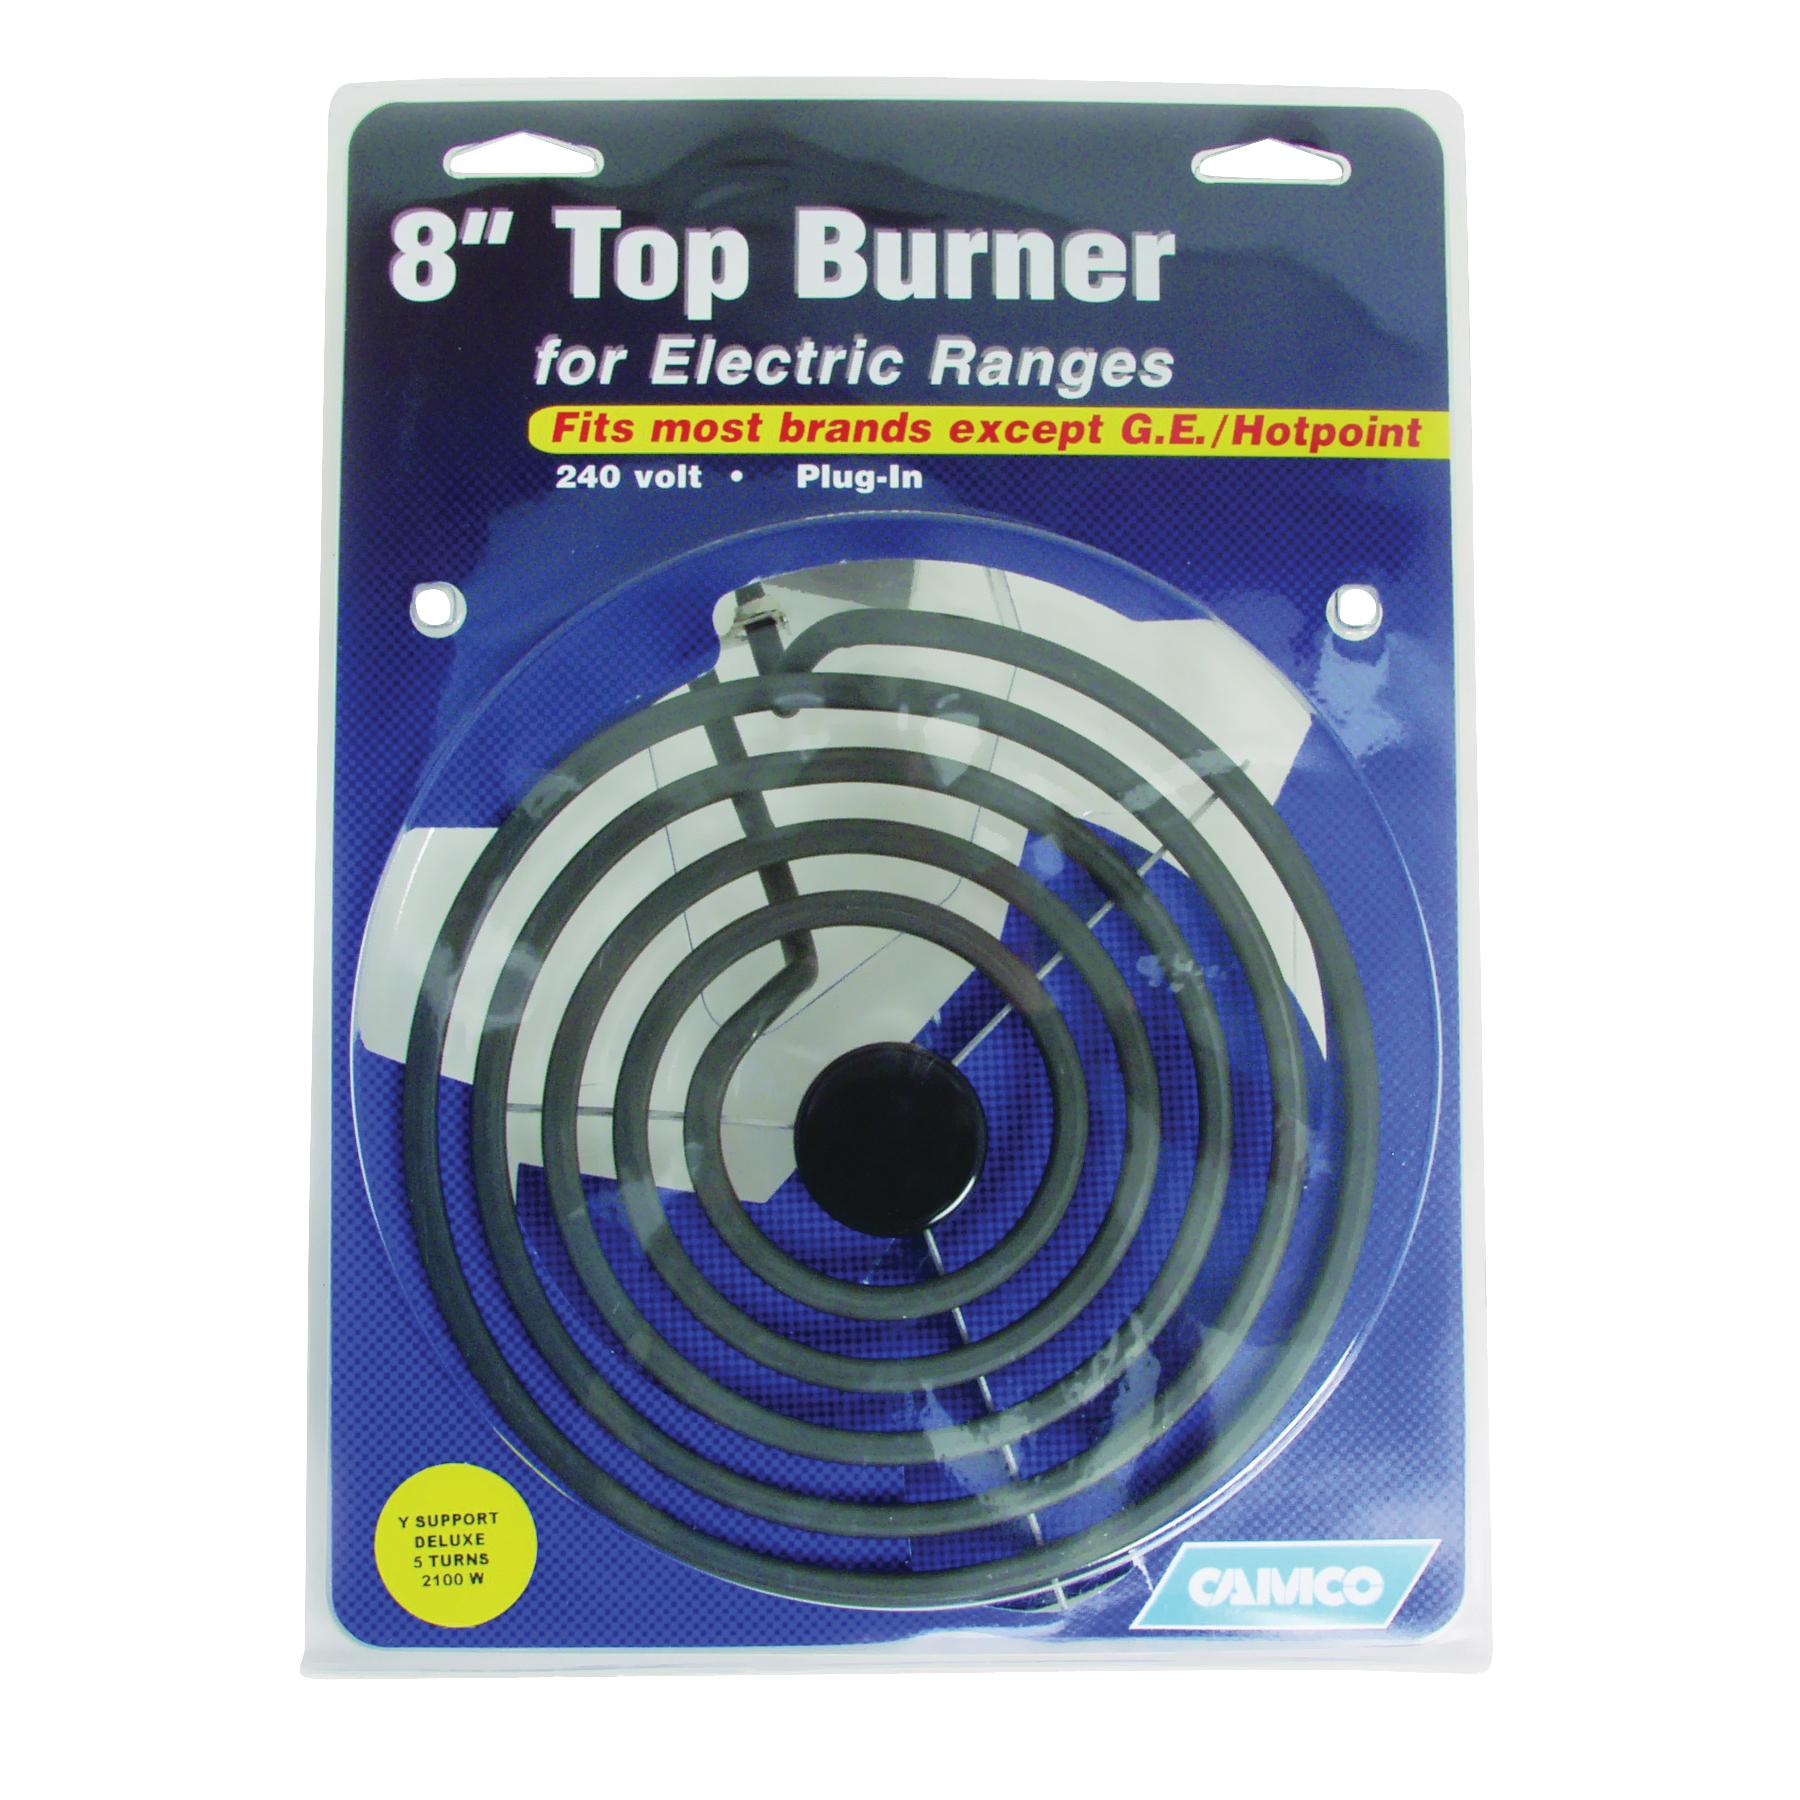 Picture of CAMCO 00253 Top Burner, 240 V, 2100 W, Plug